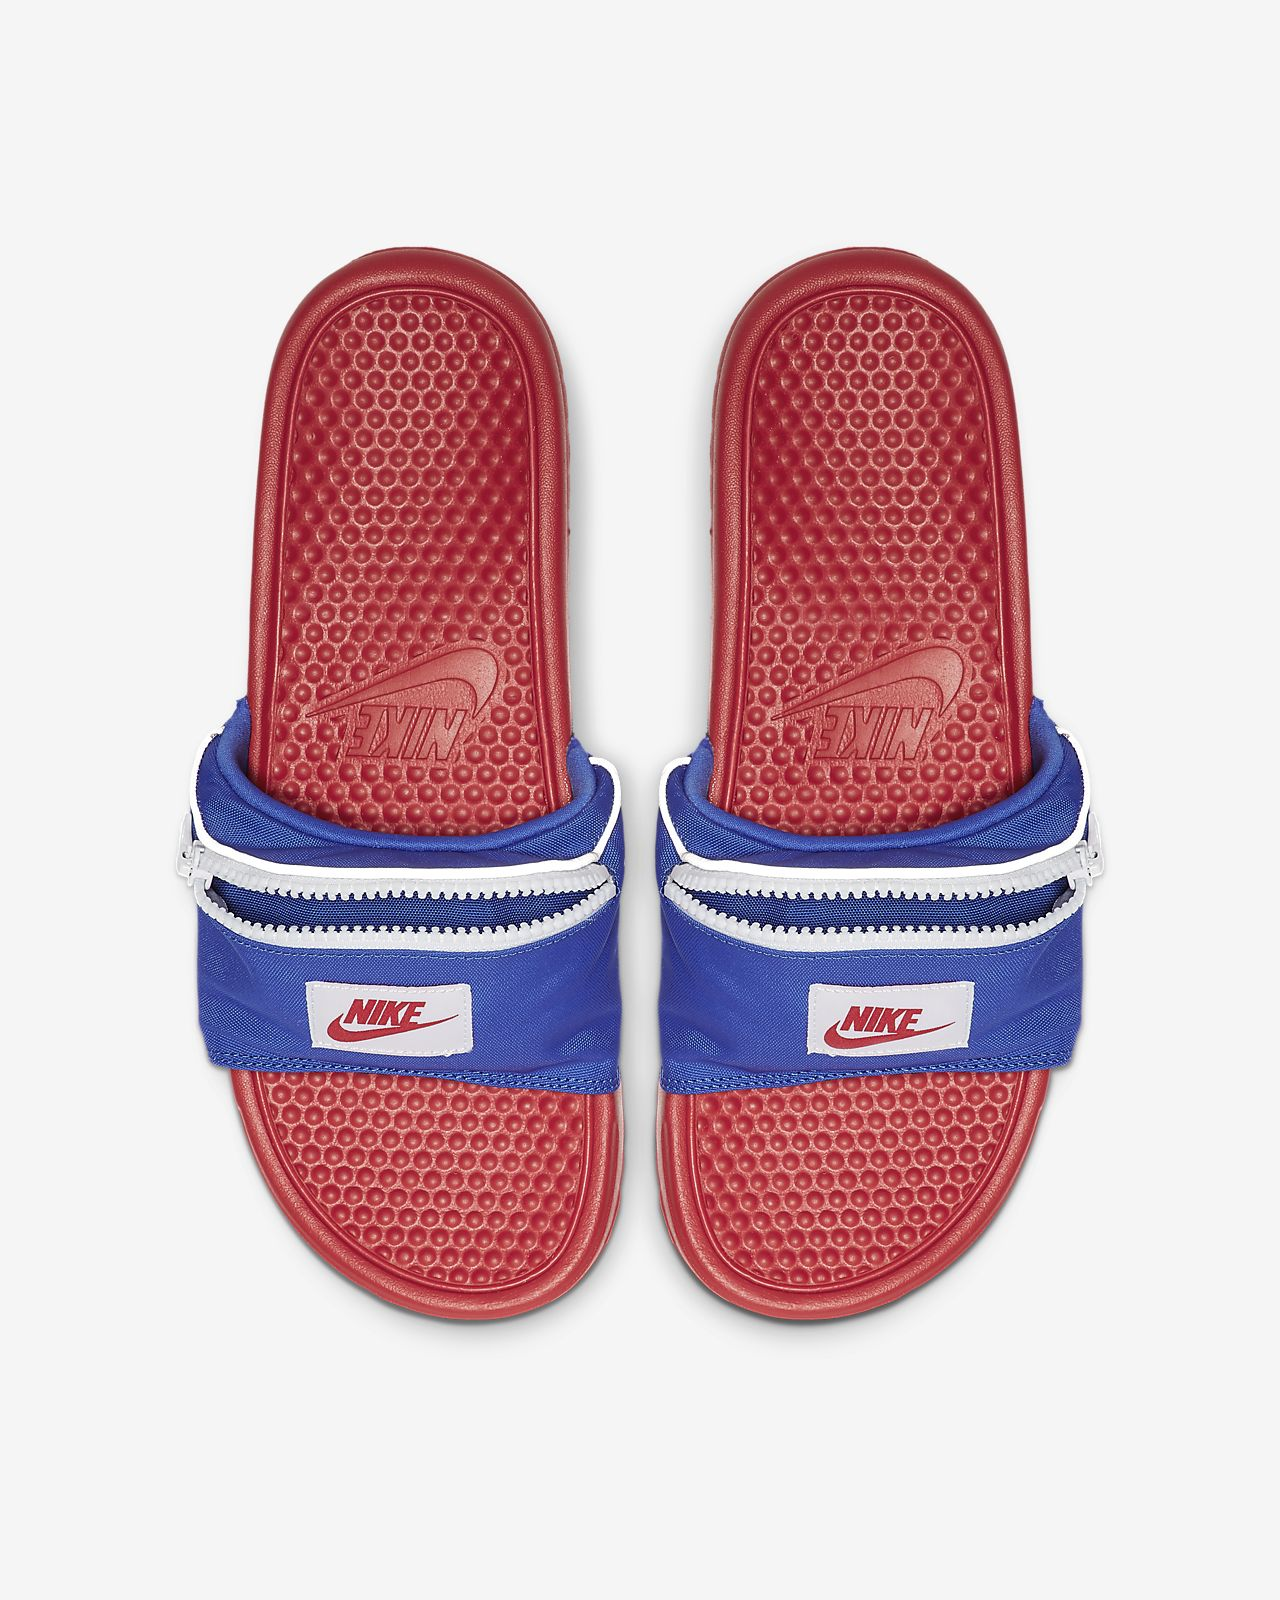 quality design 36db3 1bf26 Nike Benassi JDI Fanny Pack Men's Slide. Nike.com